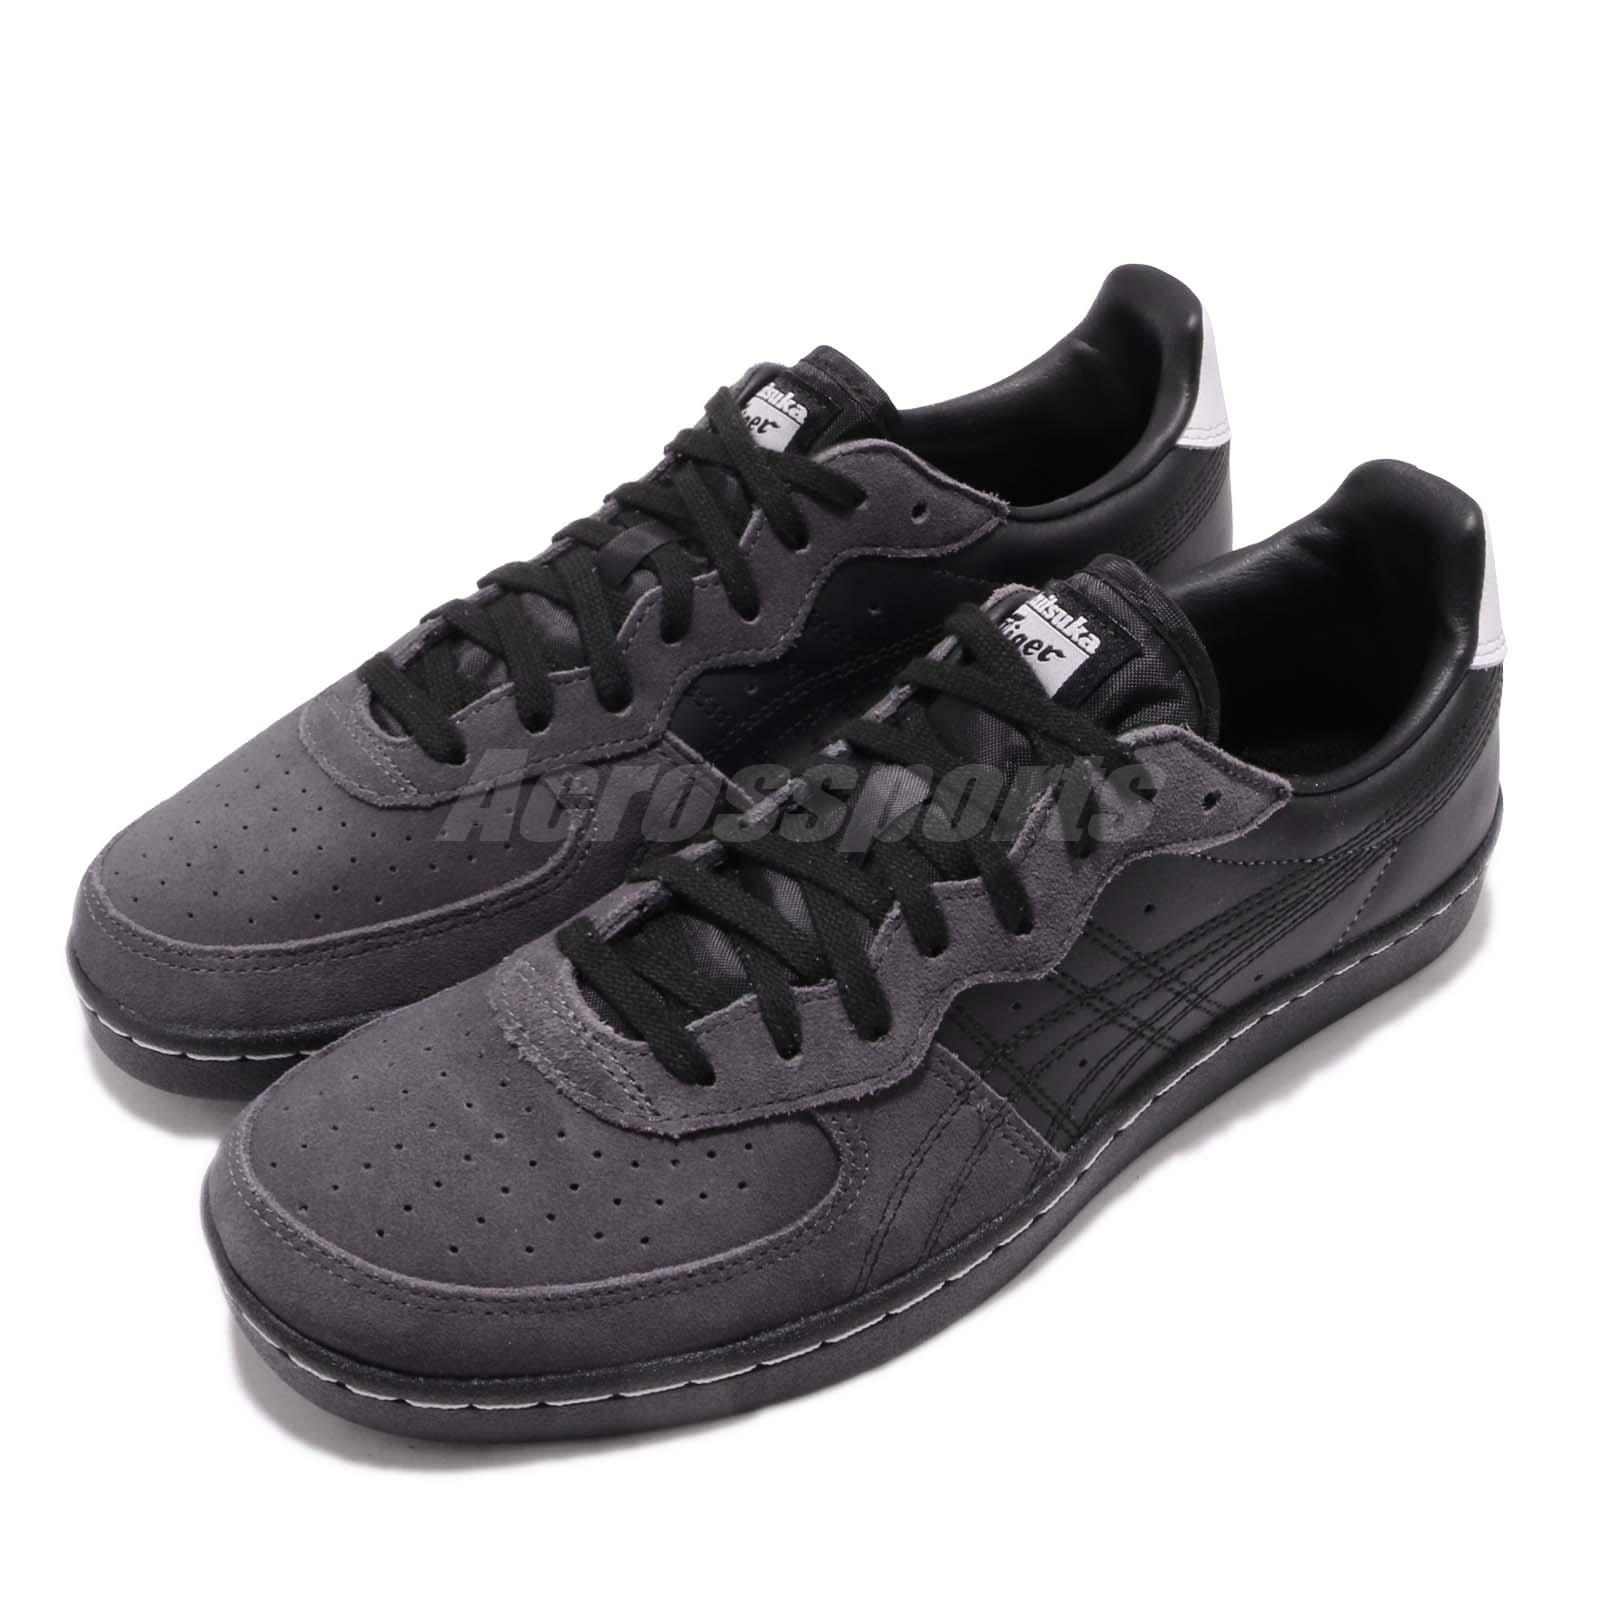 Details about Asics Onitsuka Tiger GSM AP Grey Black Men Casual Shoes  Sneakers D826L-9590